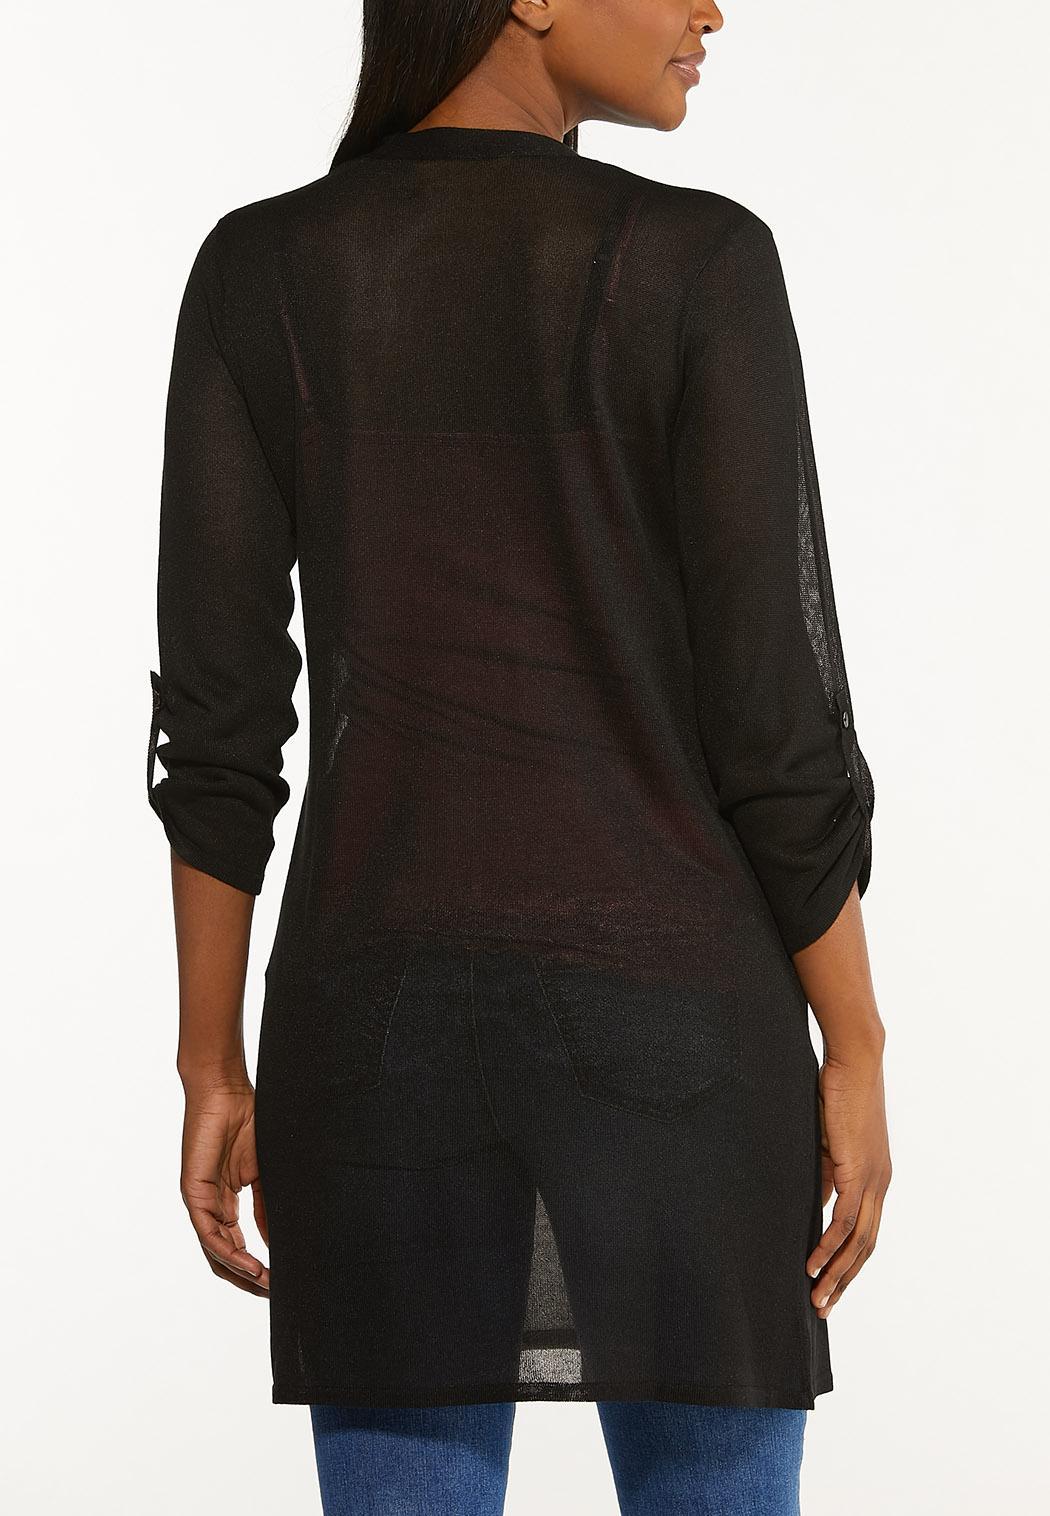 Plus Size Sheer Longline Cardigan (Item #44491750)